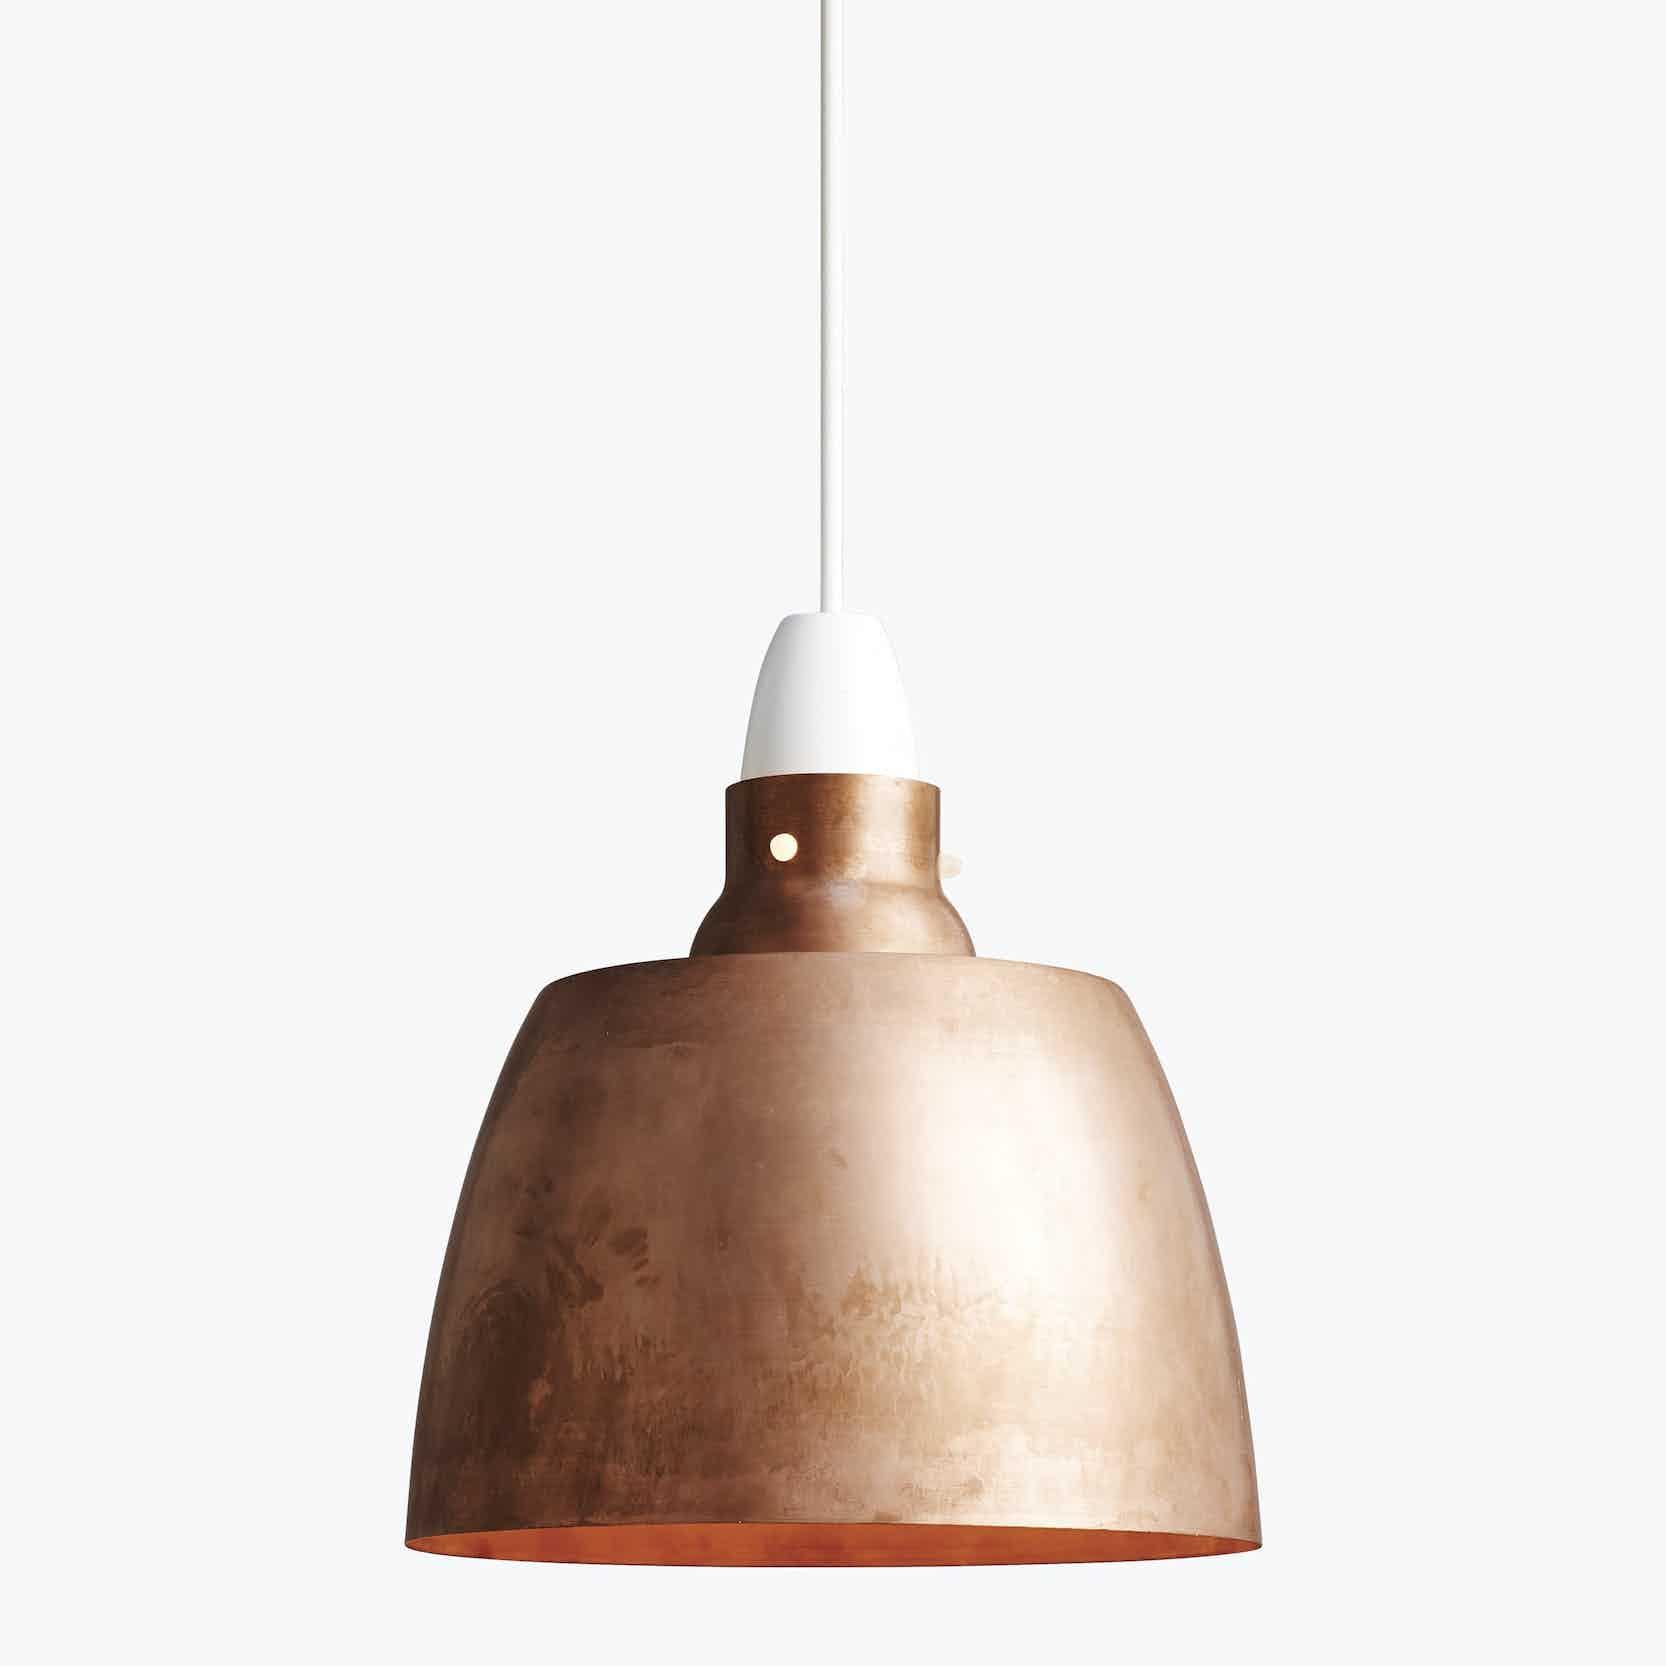 New works furniture hang on honey pendant old copper haute living